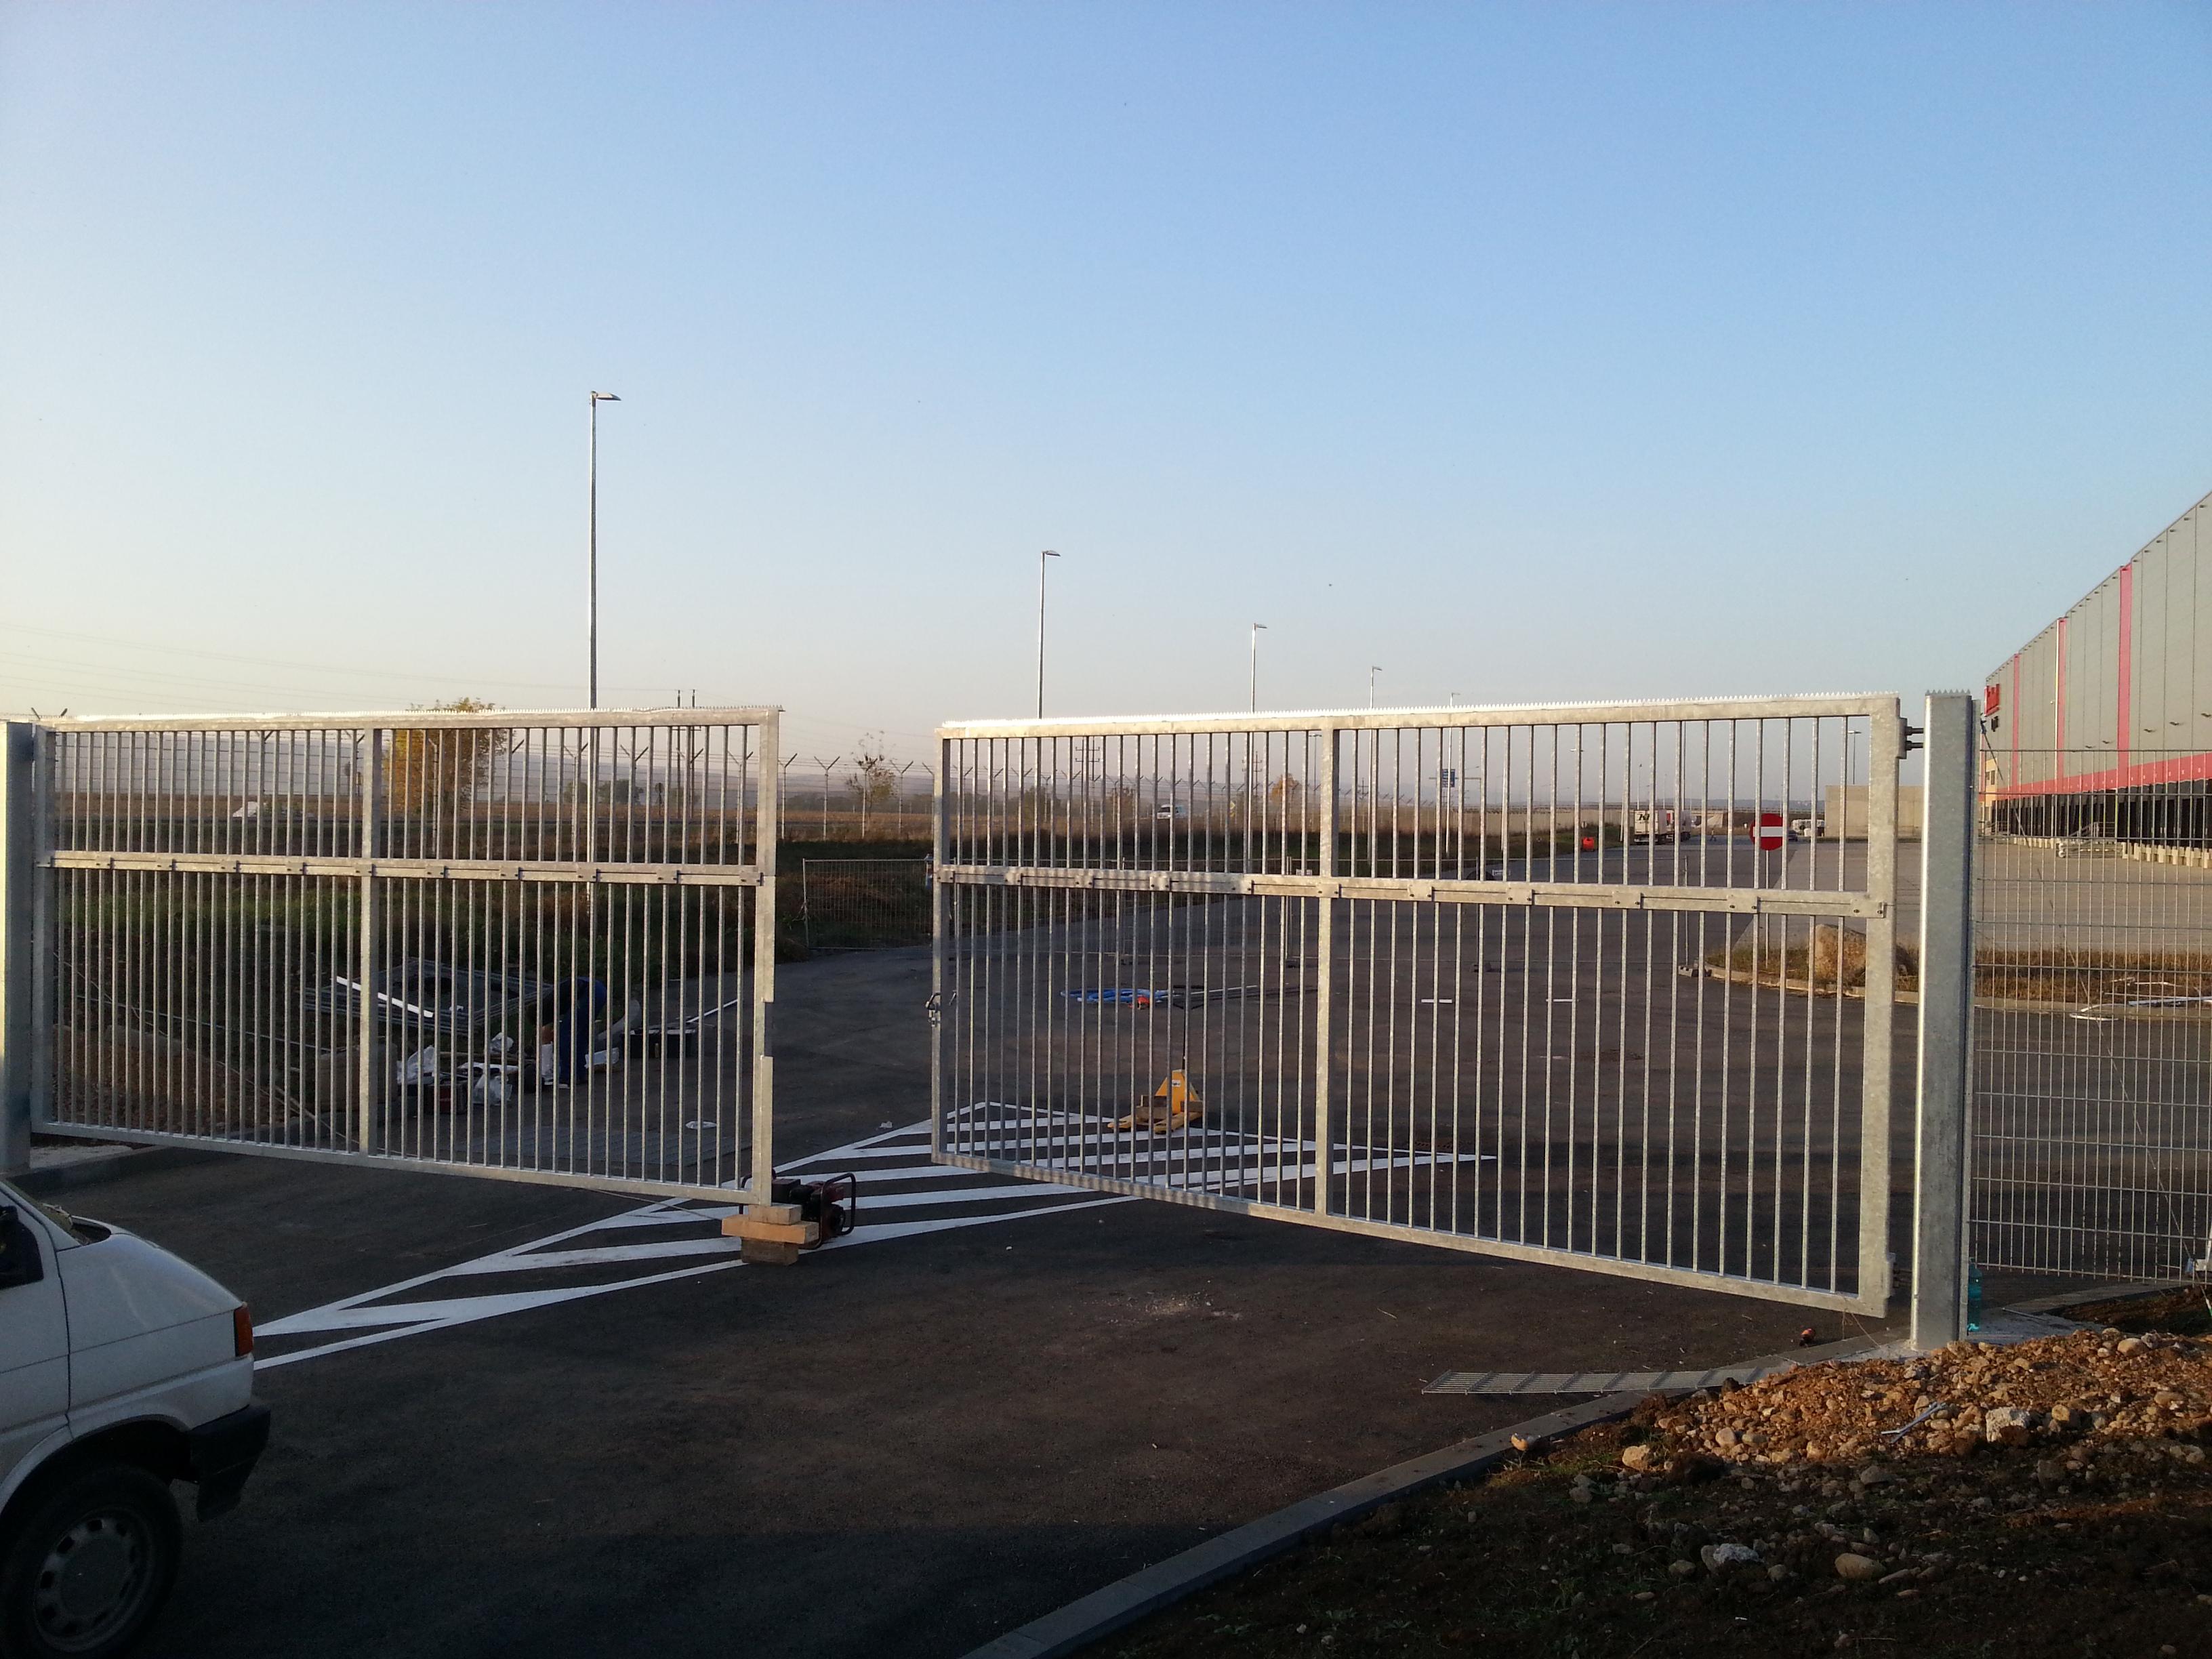 Cea mai mare poarta batanta instalata in Romania? - Cea mai mare poarta batanta instalata in